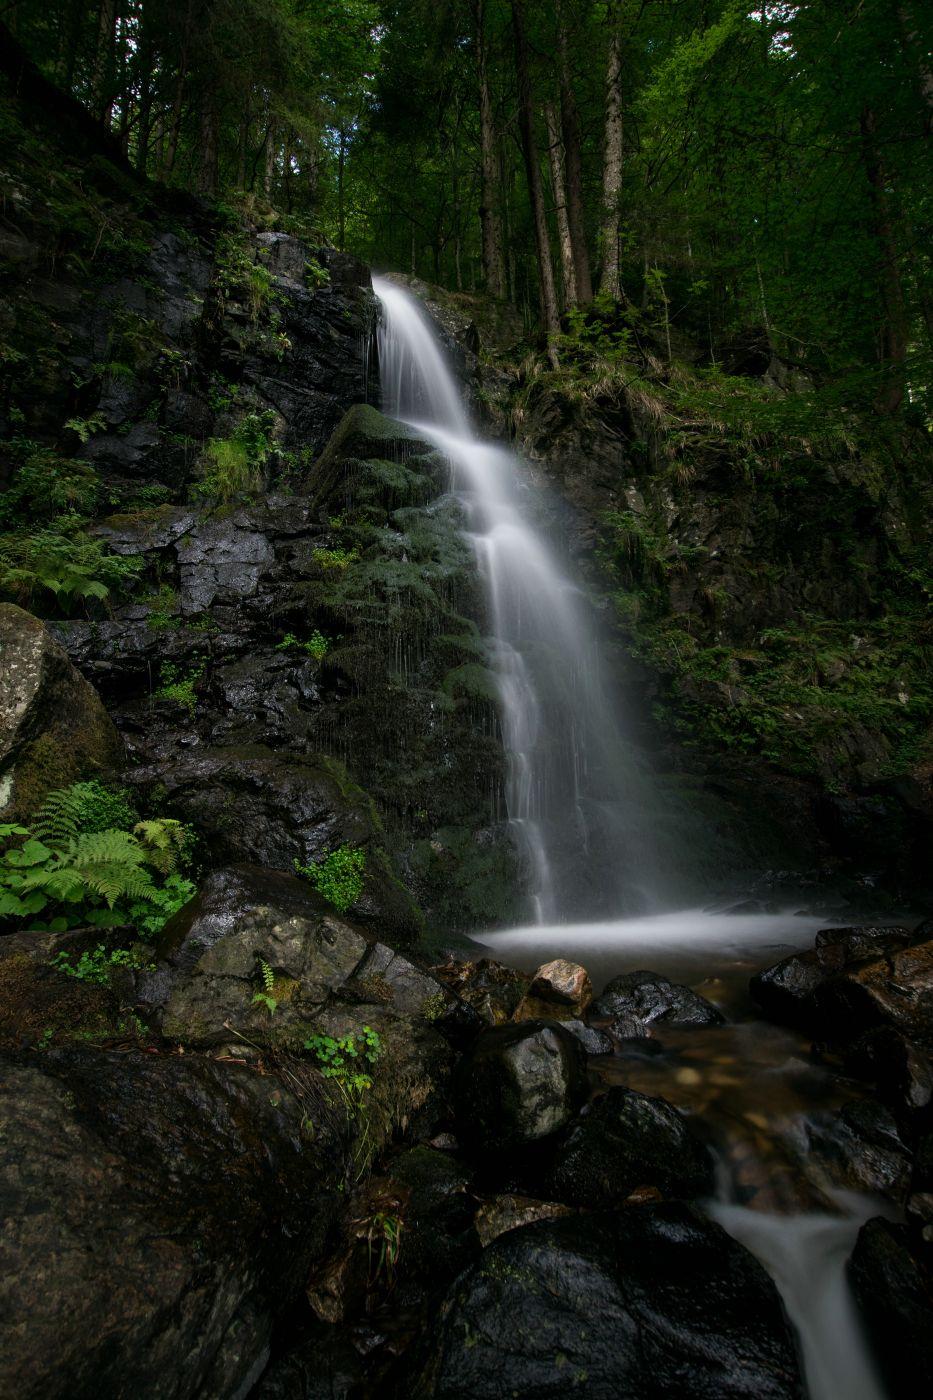 Zweribach Waterfall, Germany